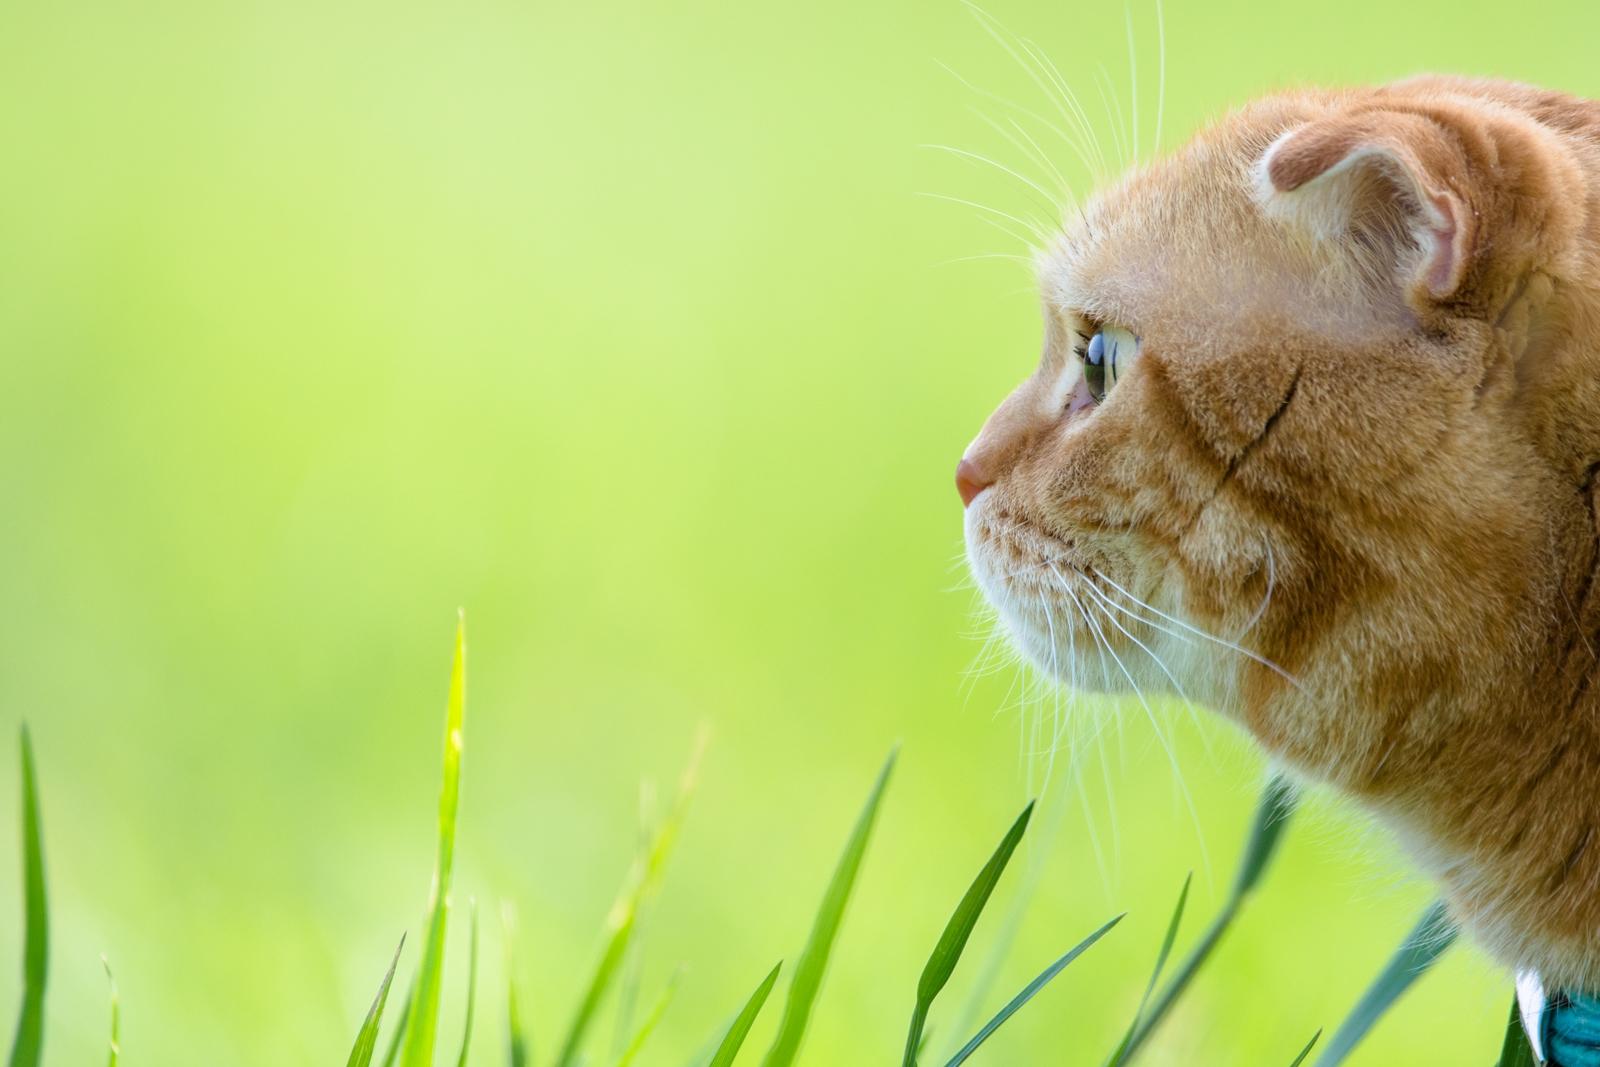 Photo: 「緑の世界」 / Fresh green world.  吸い込まれるような緑 心を奪う美しき色 綺麗な瞳に 緑の世界が広がる  モデル:トラジ  Nikon D7200 SIGMA 150-600mm F5-6.3 DG OS HSM Contemporary  #cat #kawaii #nikon #sigma #木曜ポートニャート #トラジオフ  ( http://takafumiooshio.com/archives/2408 )